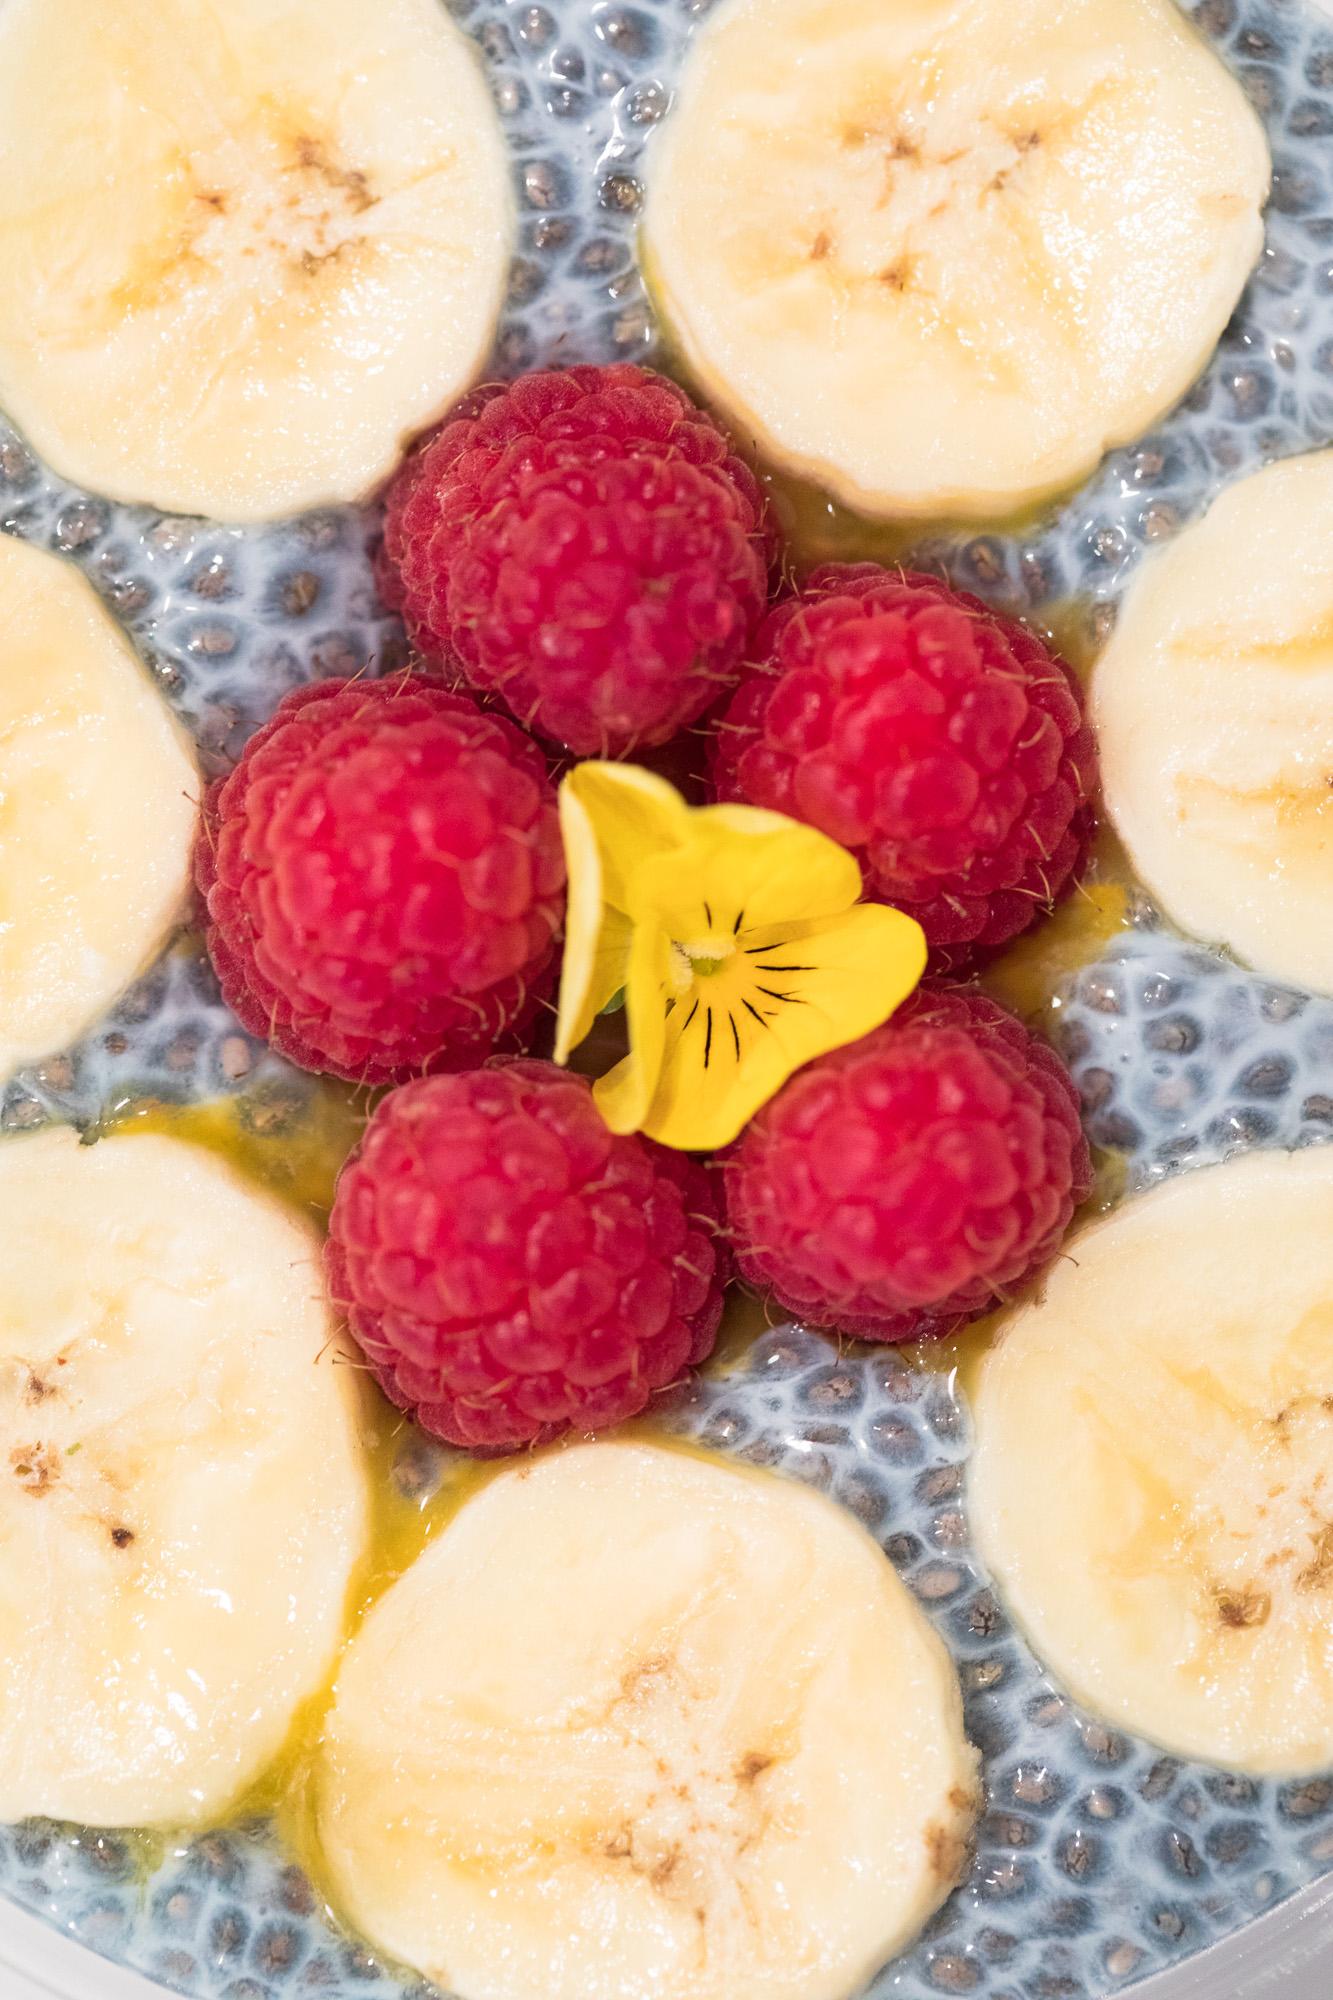 maka-vegan-gluten-free-cafe-breakfast-bowl-7.jpg